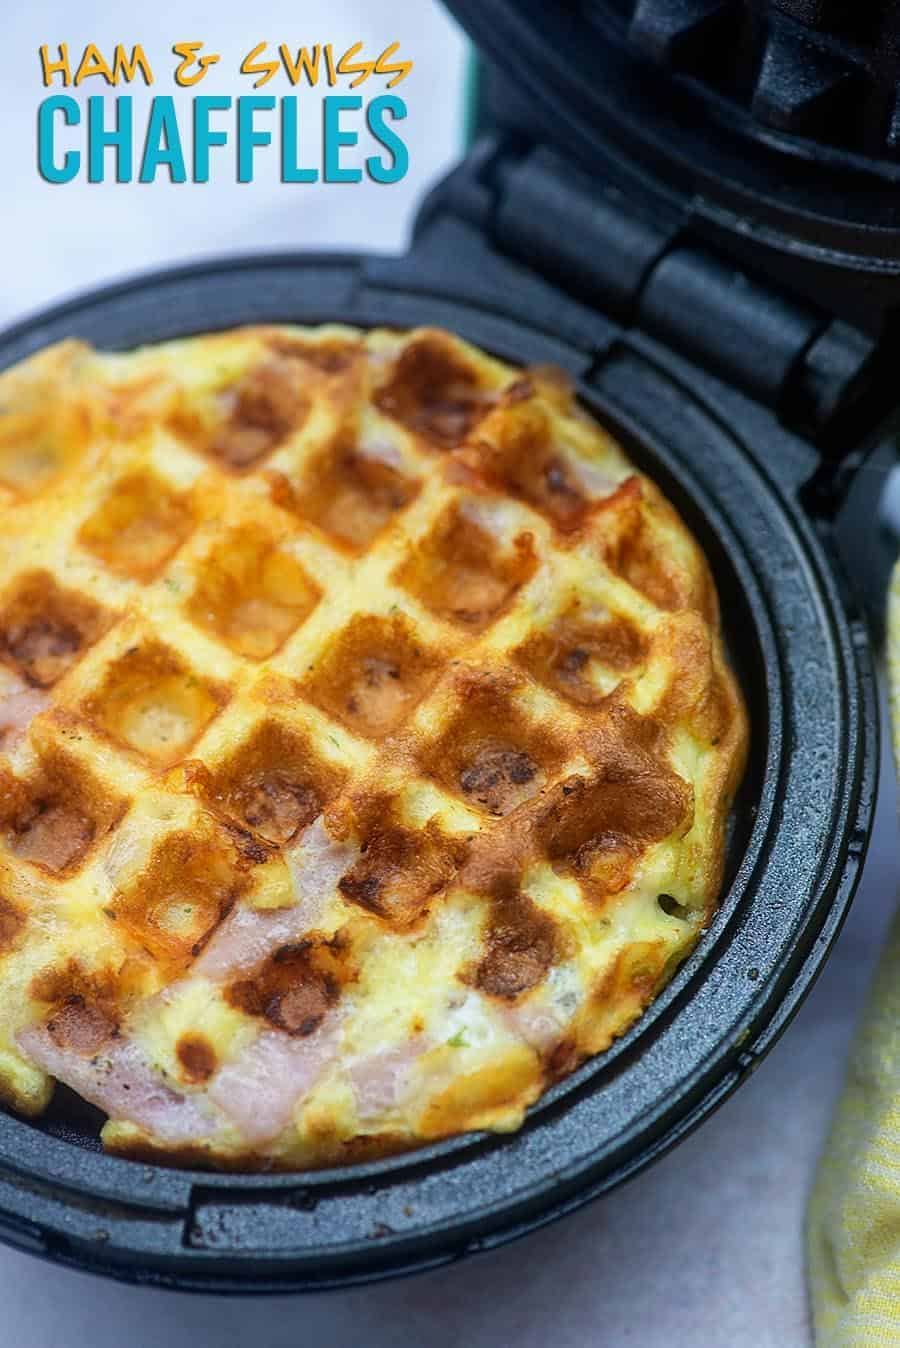 A chaffle sitting in a mini waffle iron